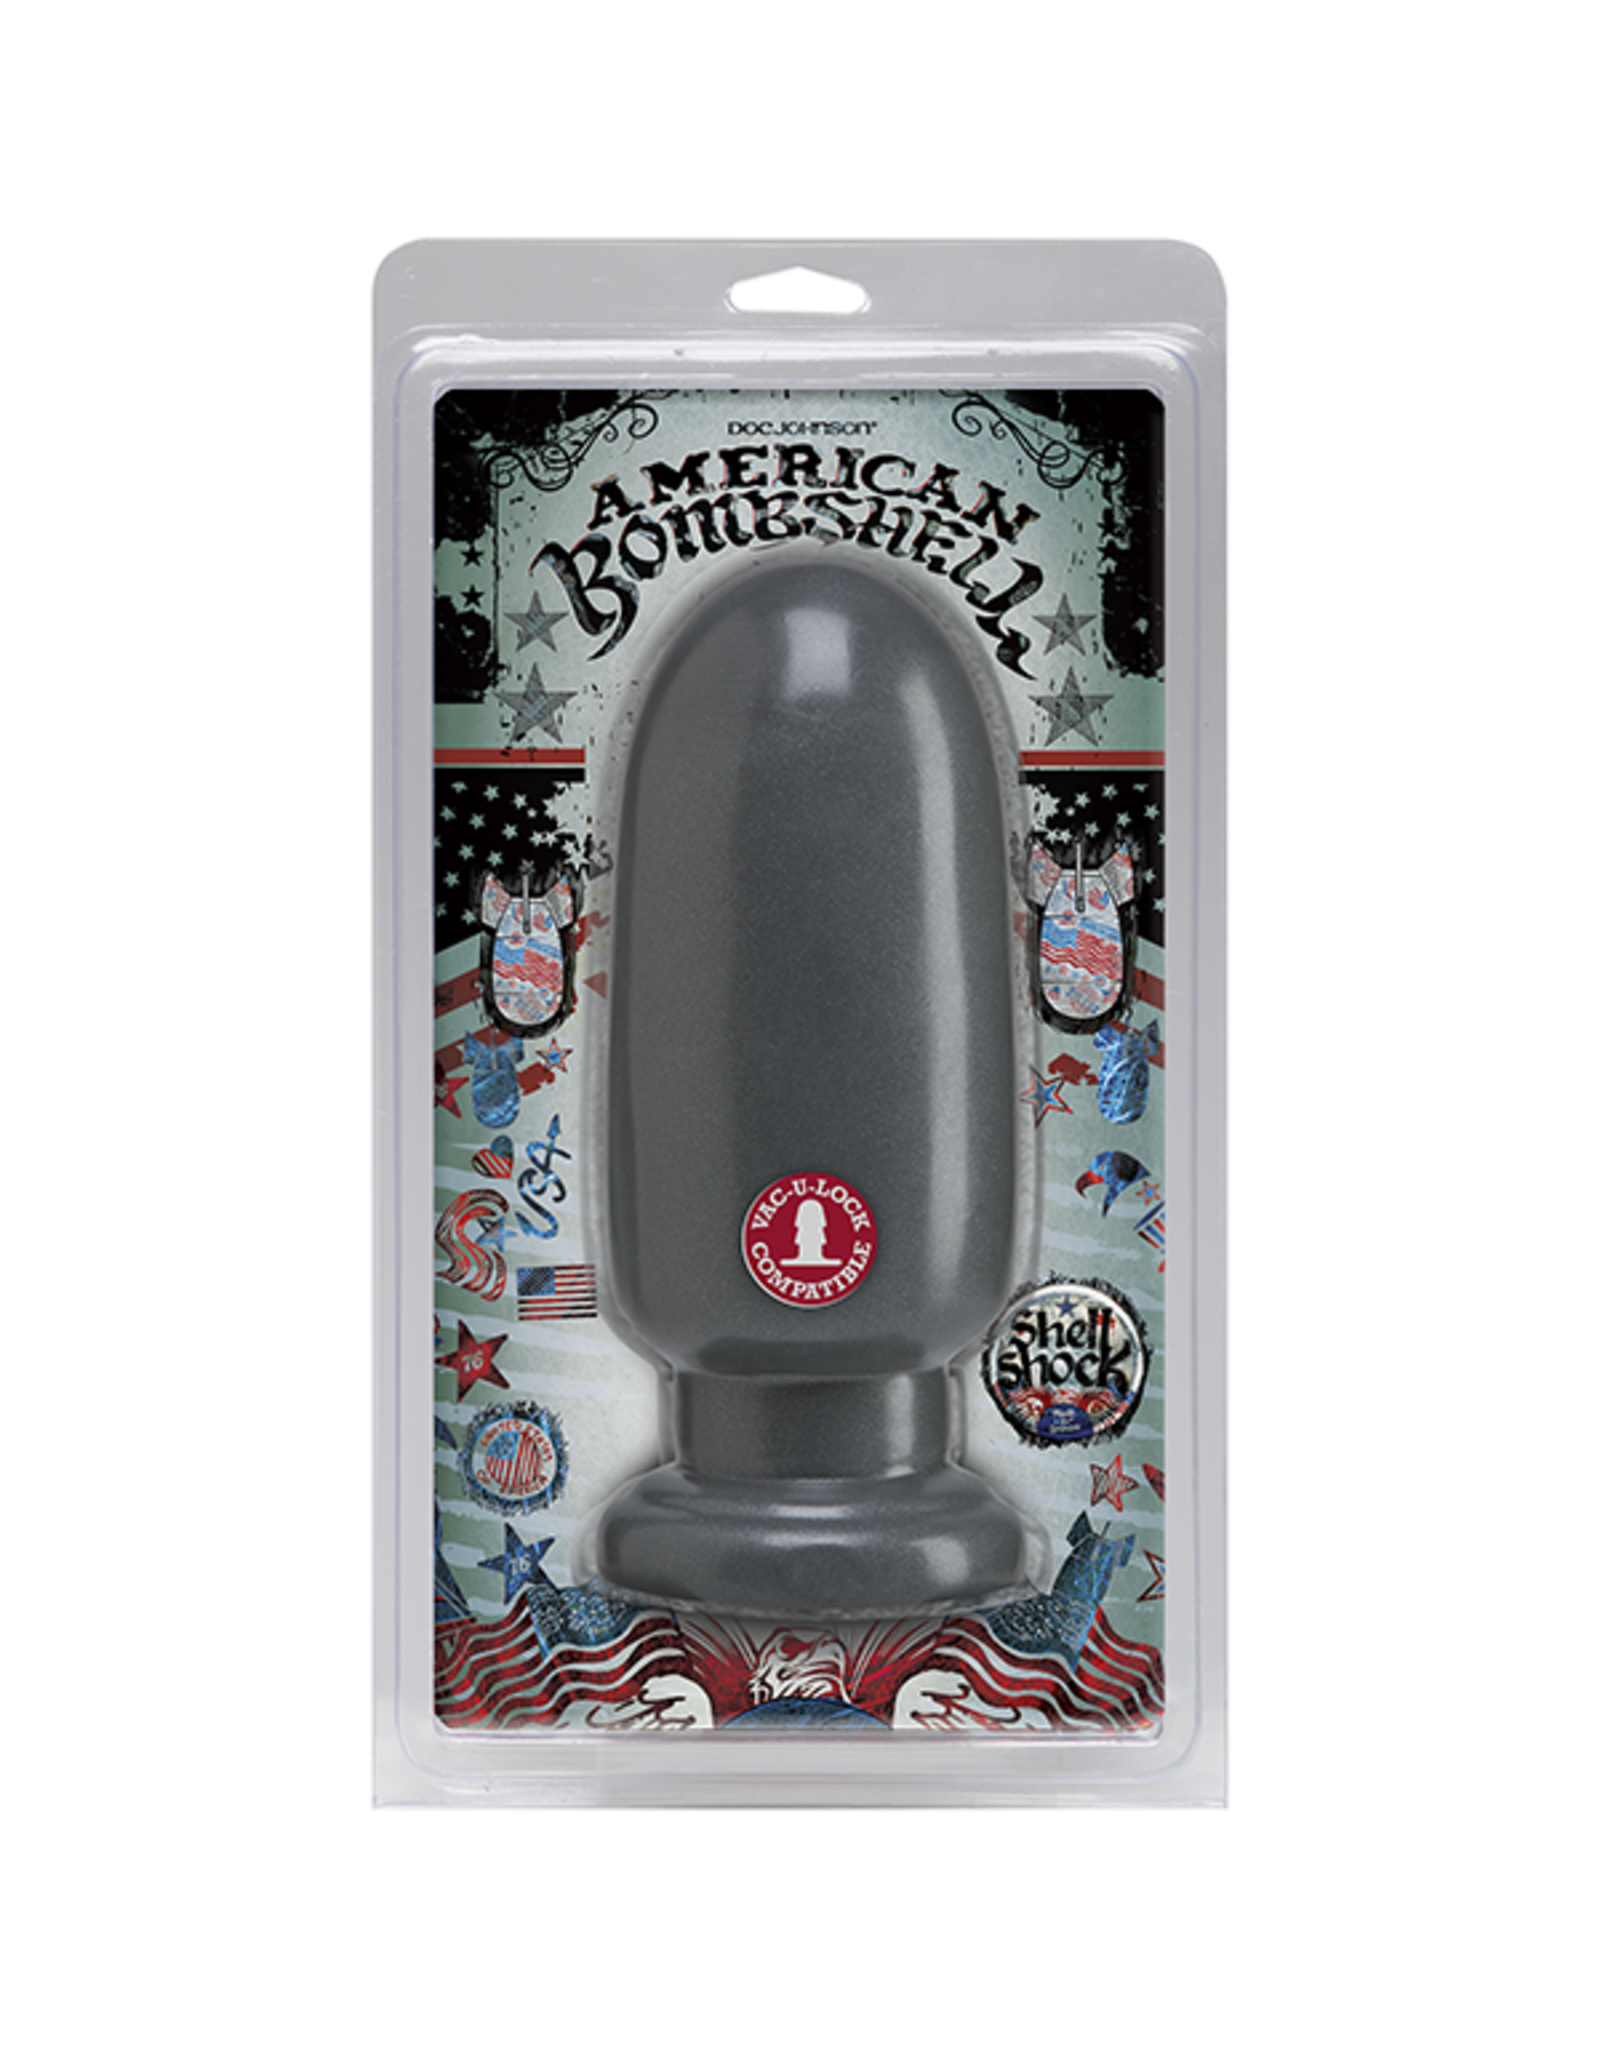 American Bombshell American Bombshell  Shell Shock - Large